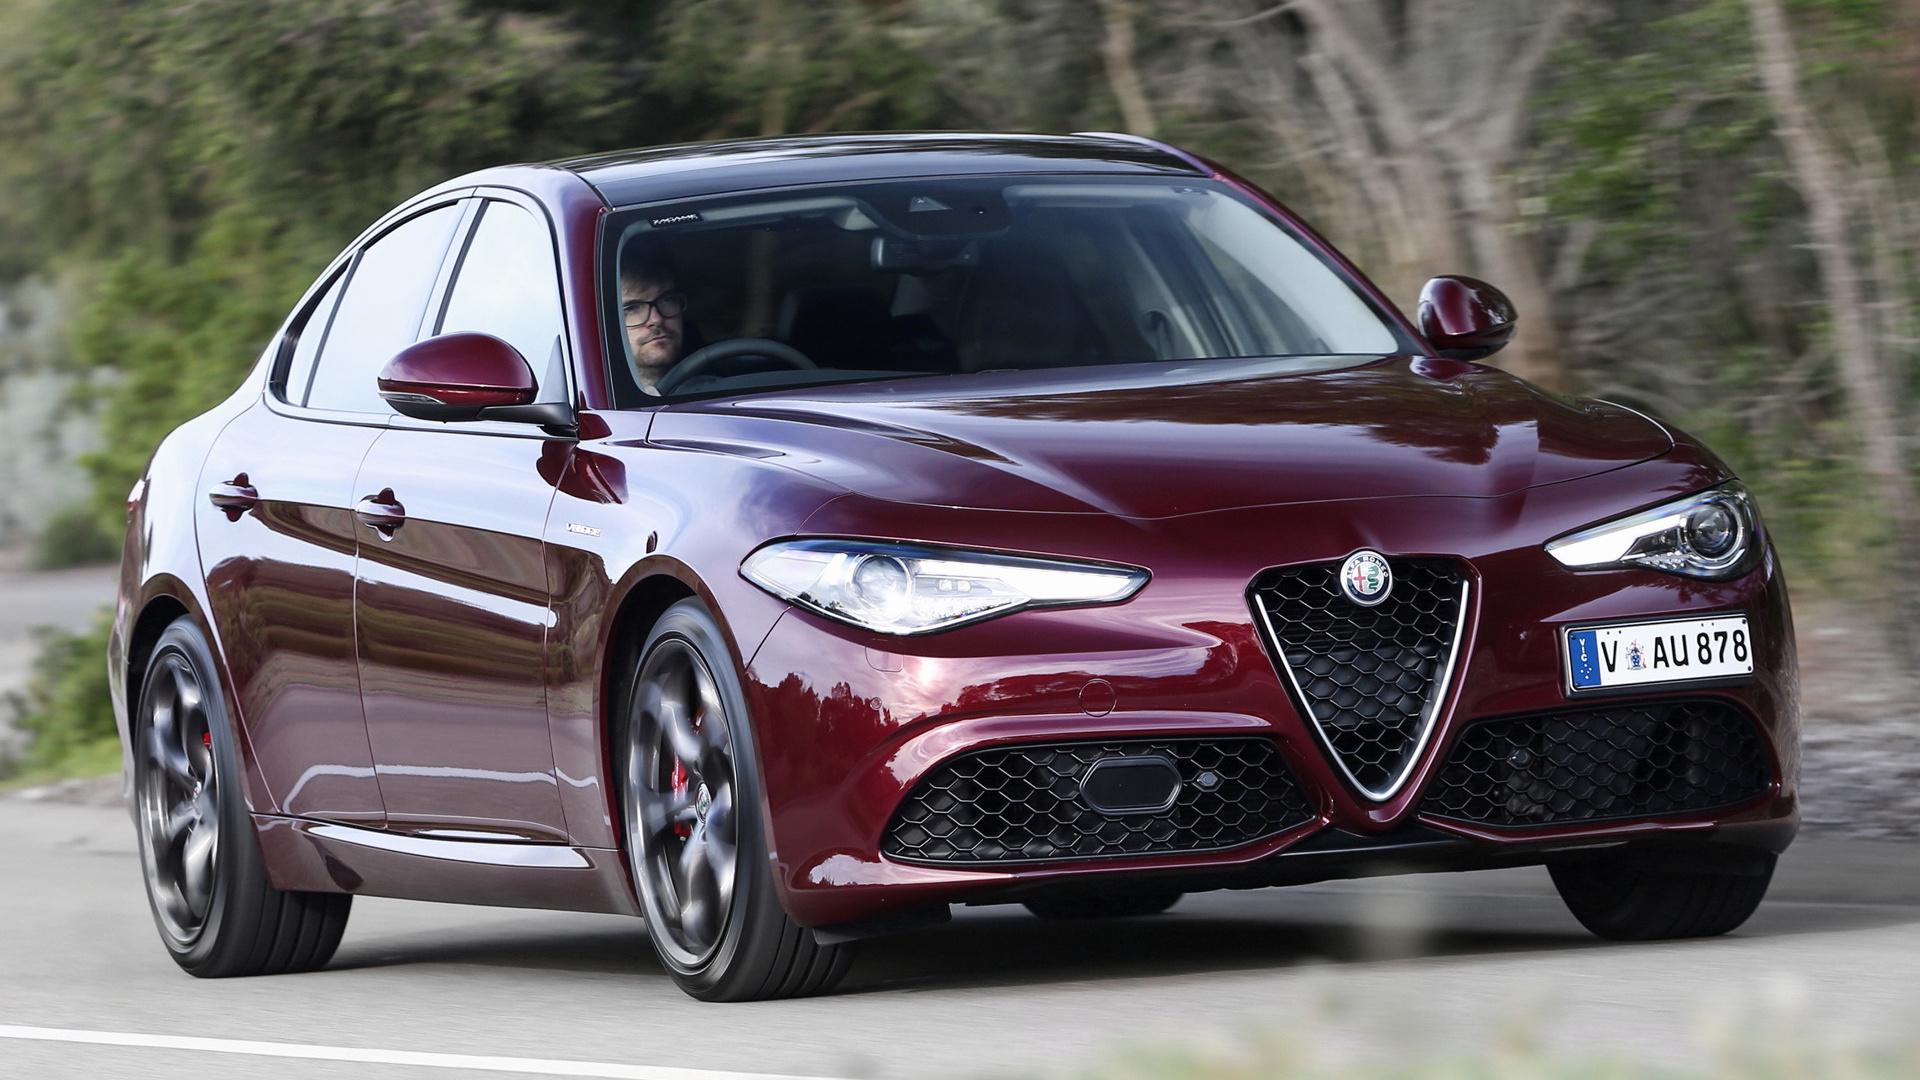 Alfa Giulia Veloce >> Alfa Romeo Giulia Veloce (2017) AU Wallpapers and HD Images - Car Pixel